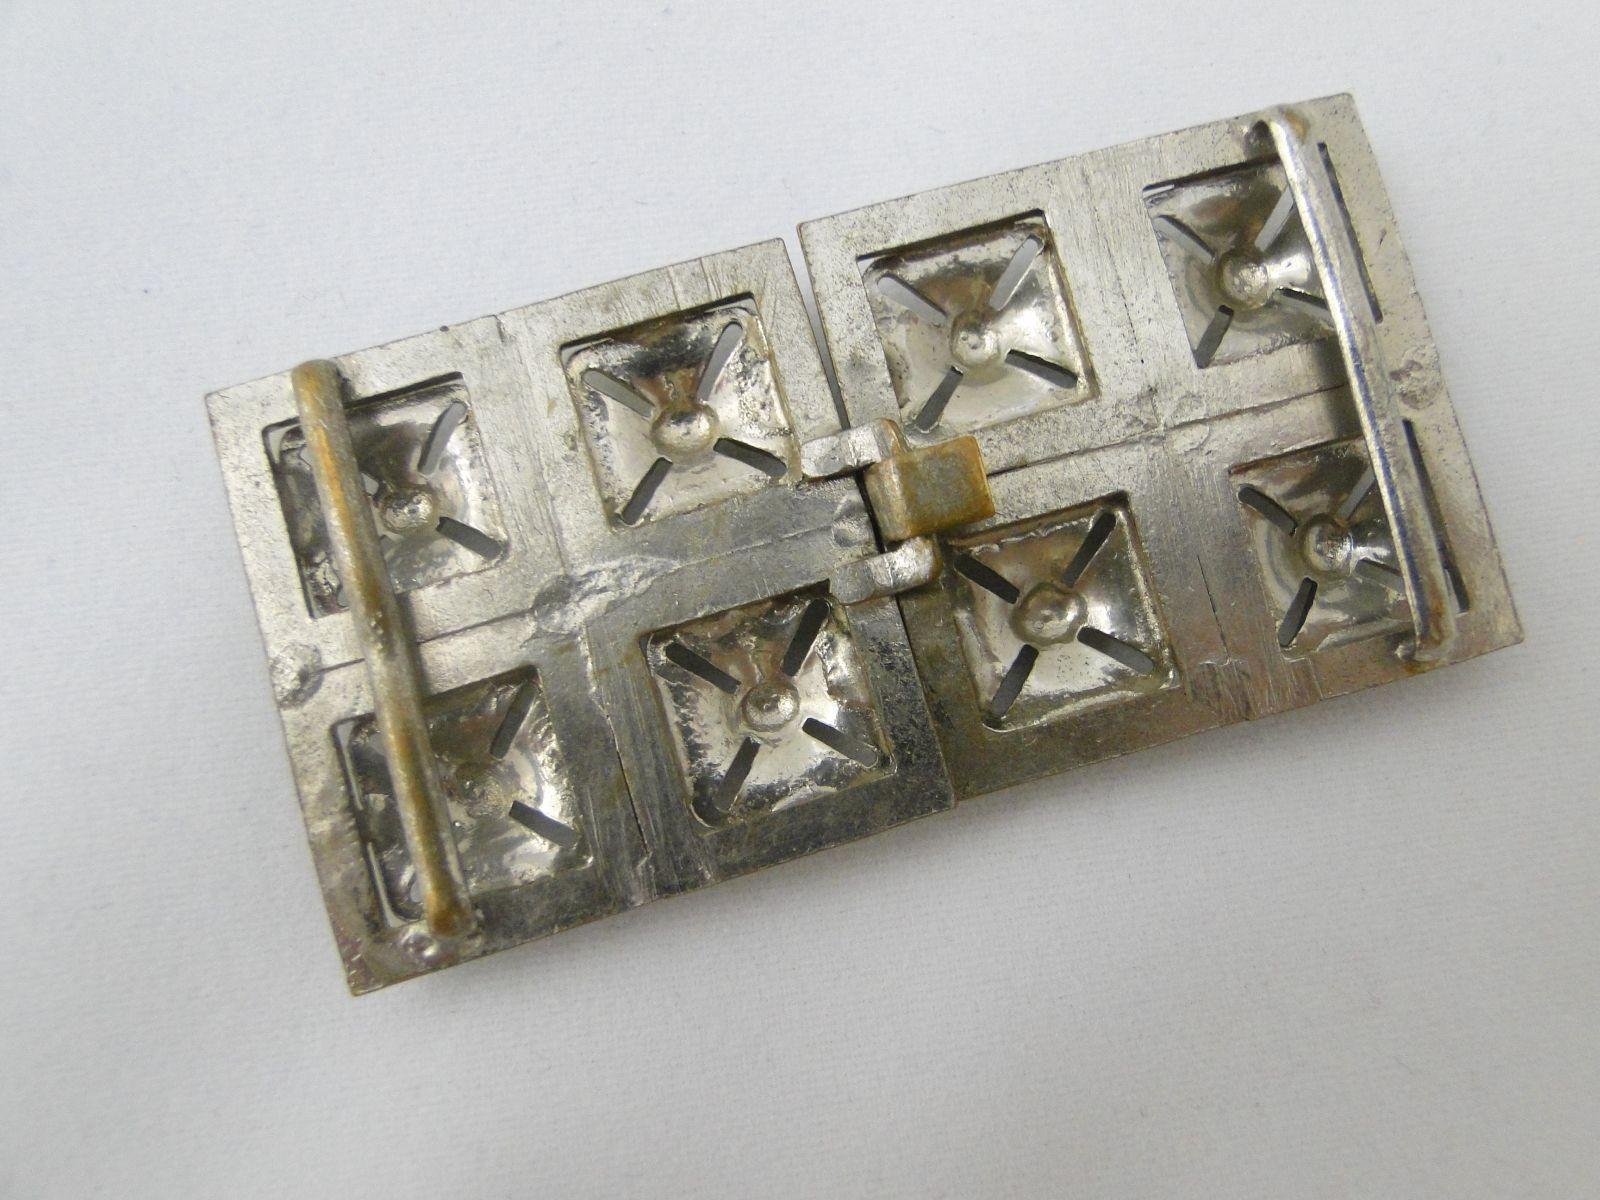 DSC03857.JPG (1600×1200)